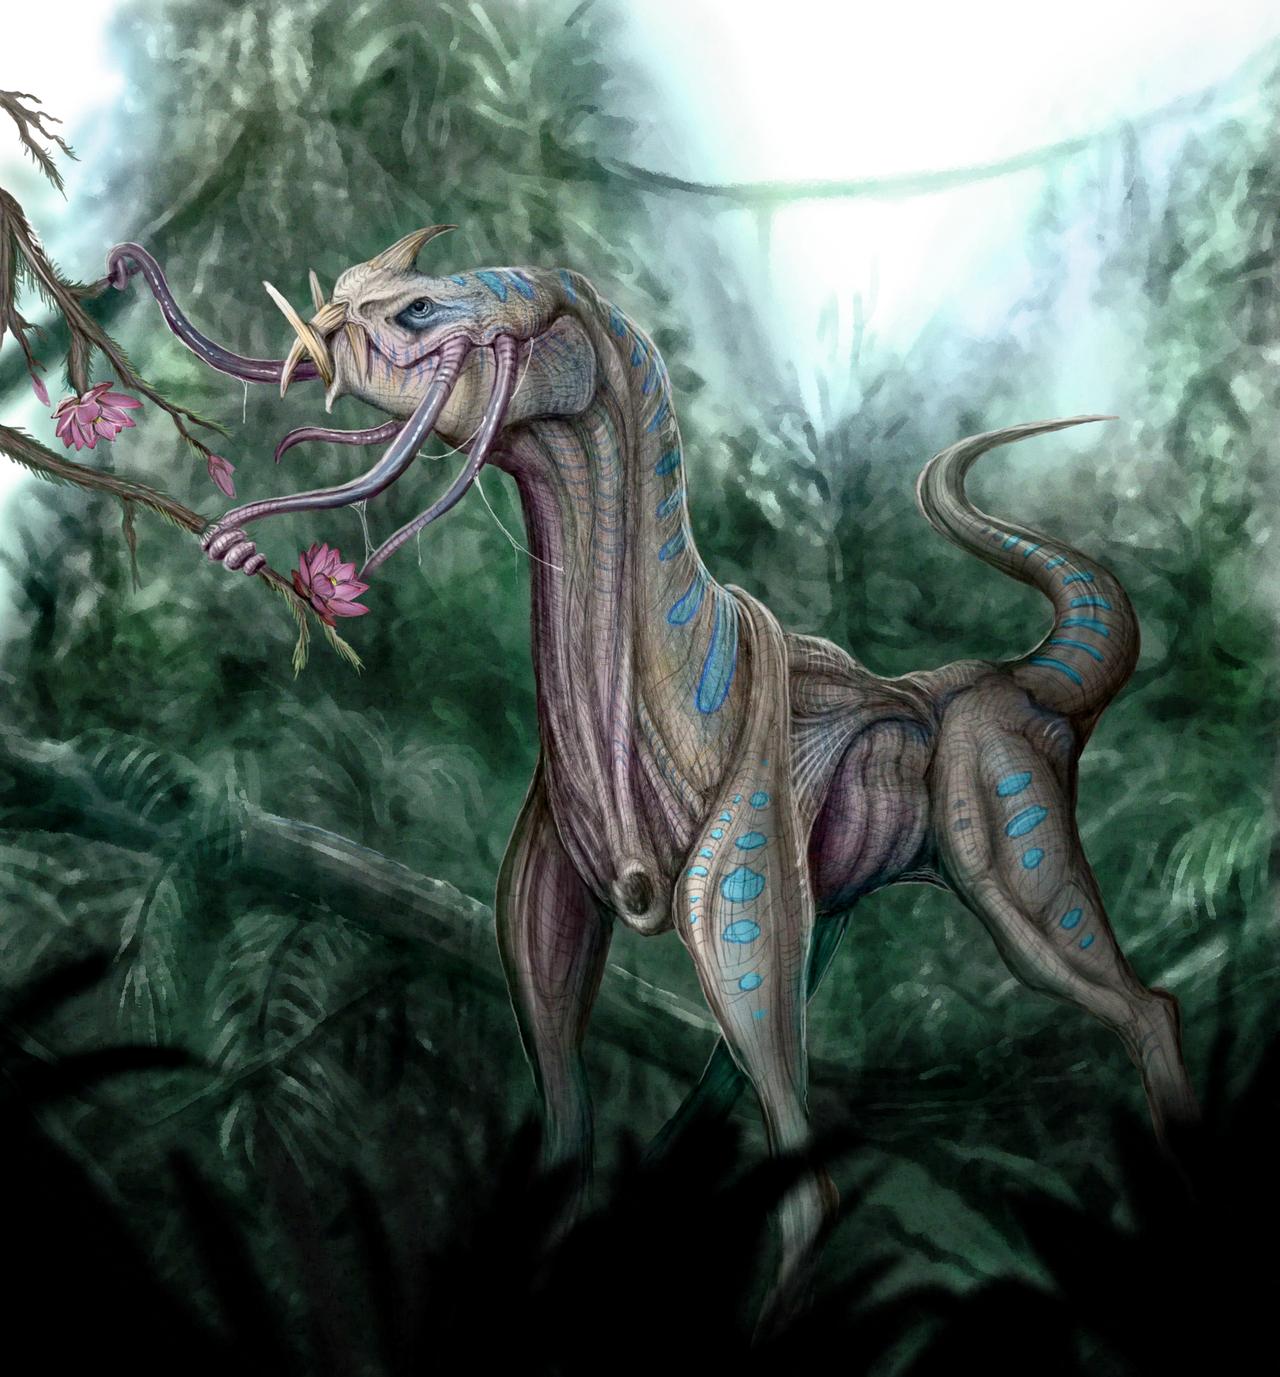 Jungle Hummingbeast by emkaKl